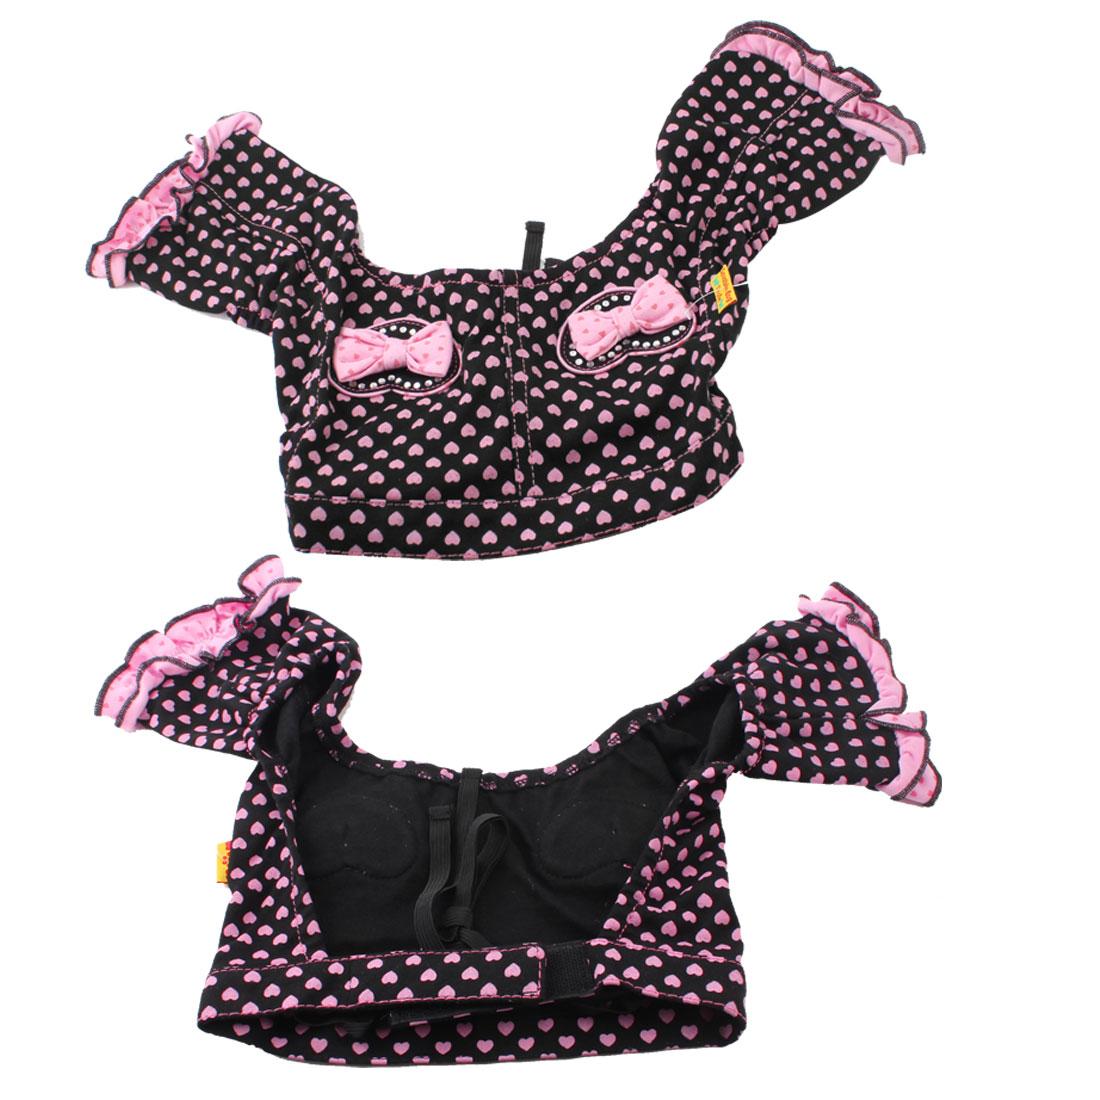 Pink Black Heart Pattern Hook Loop Fastener Pet Dog Doggie Trousers Pants Size S